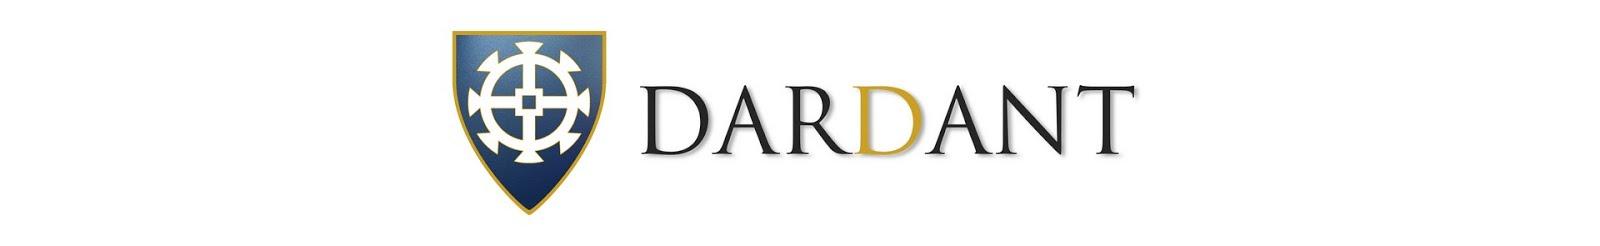 Dardant - Music